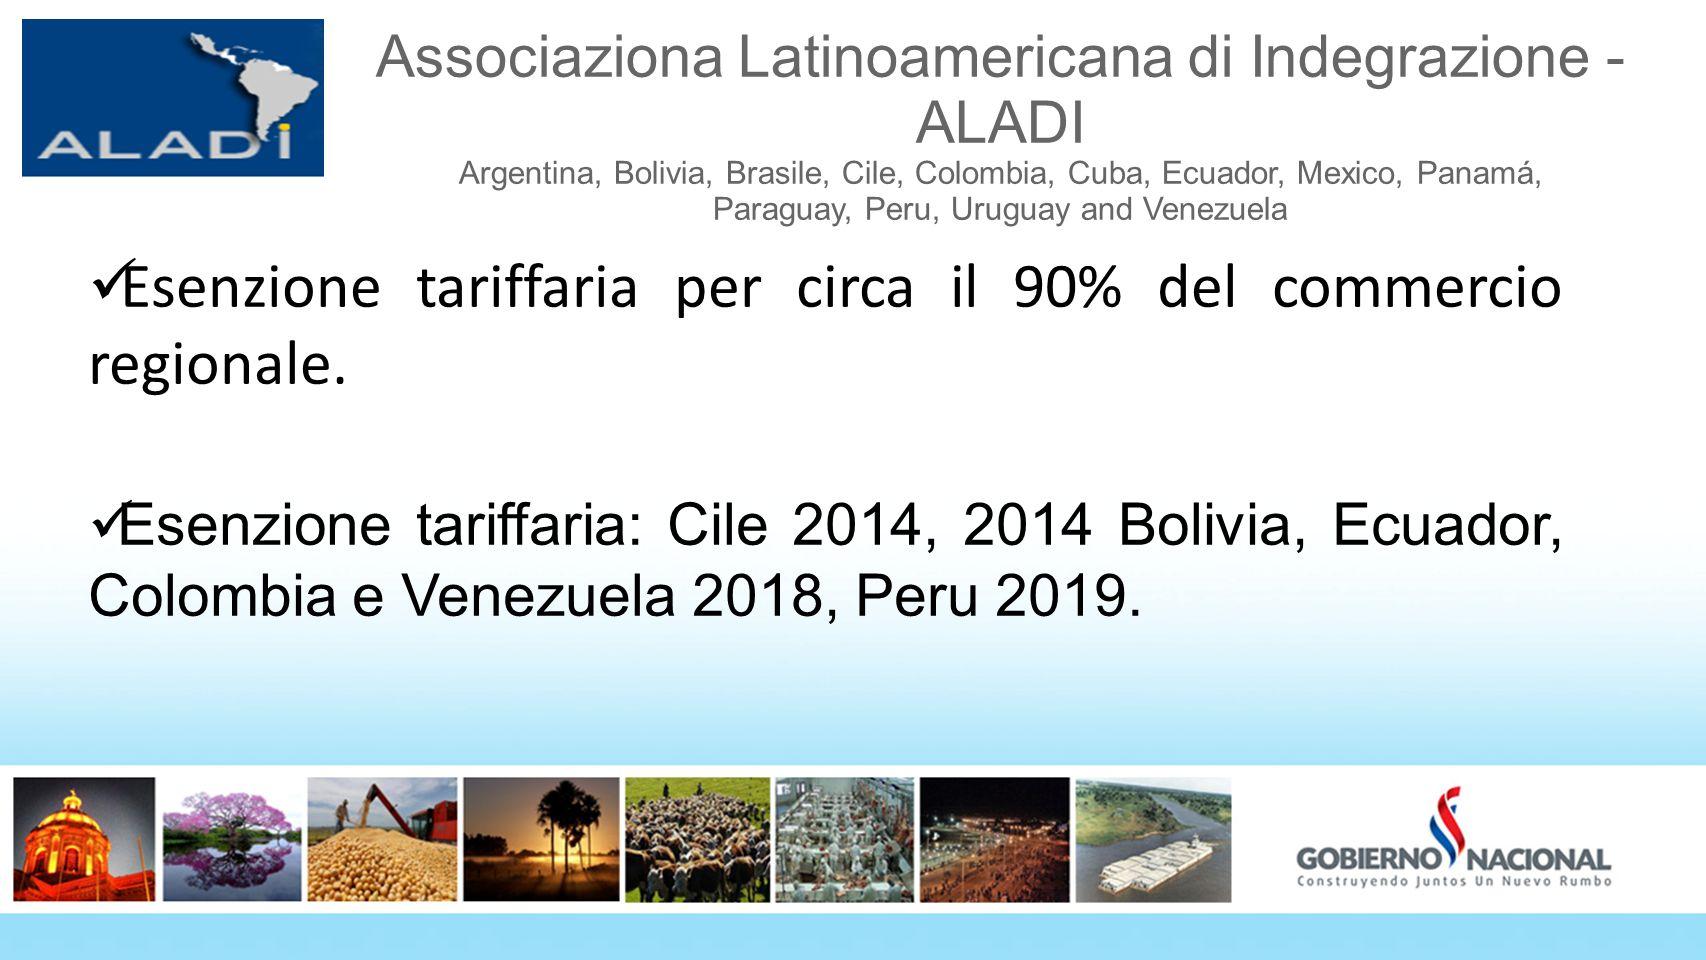 Associaziona Latinoamericana di Indegrazione - ALADI Argentina, Bolivia, Brasile, Cile, Colombia, Cuba, Ecuador, Mexico, Panamá, Paraguay, Peru, Urugu